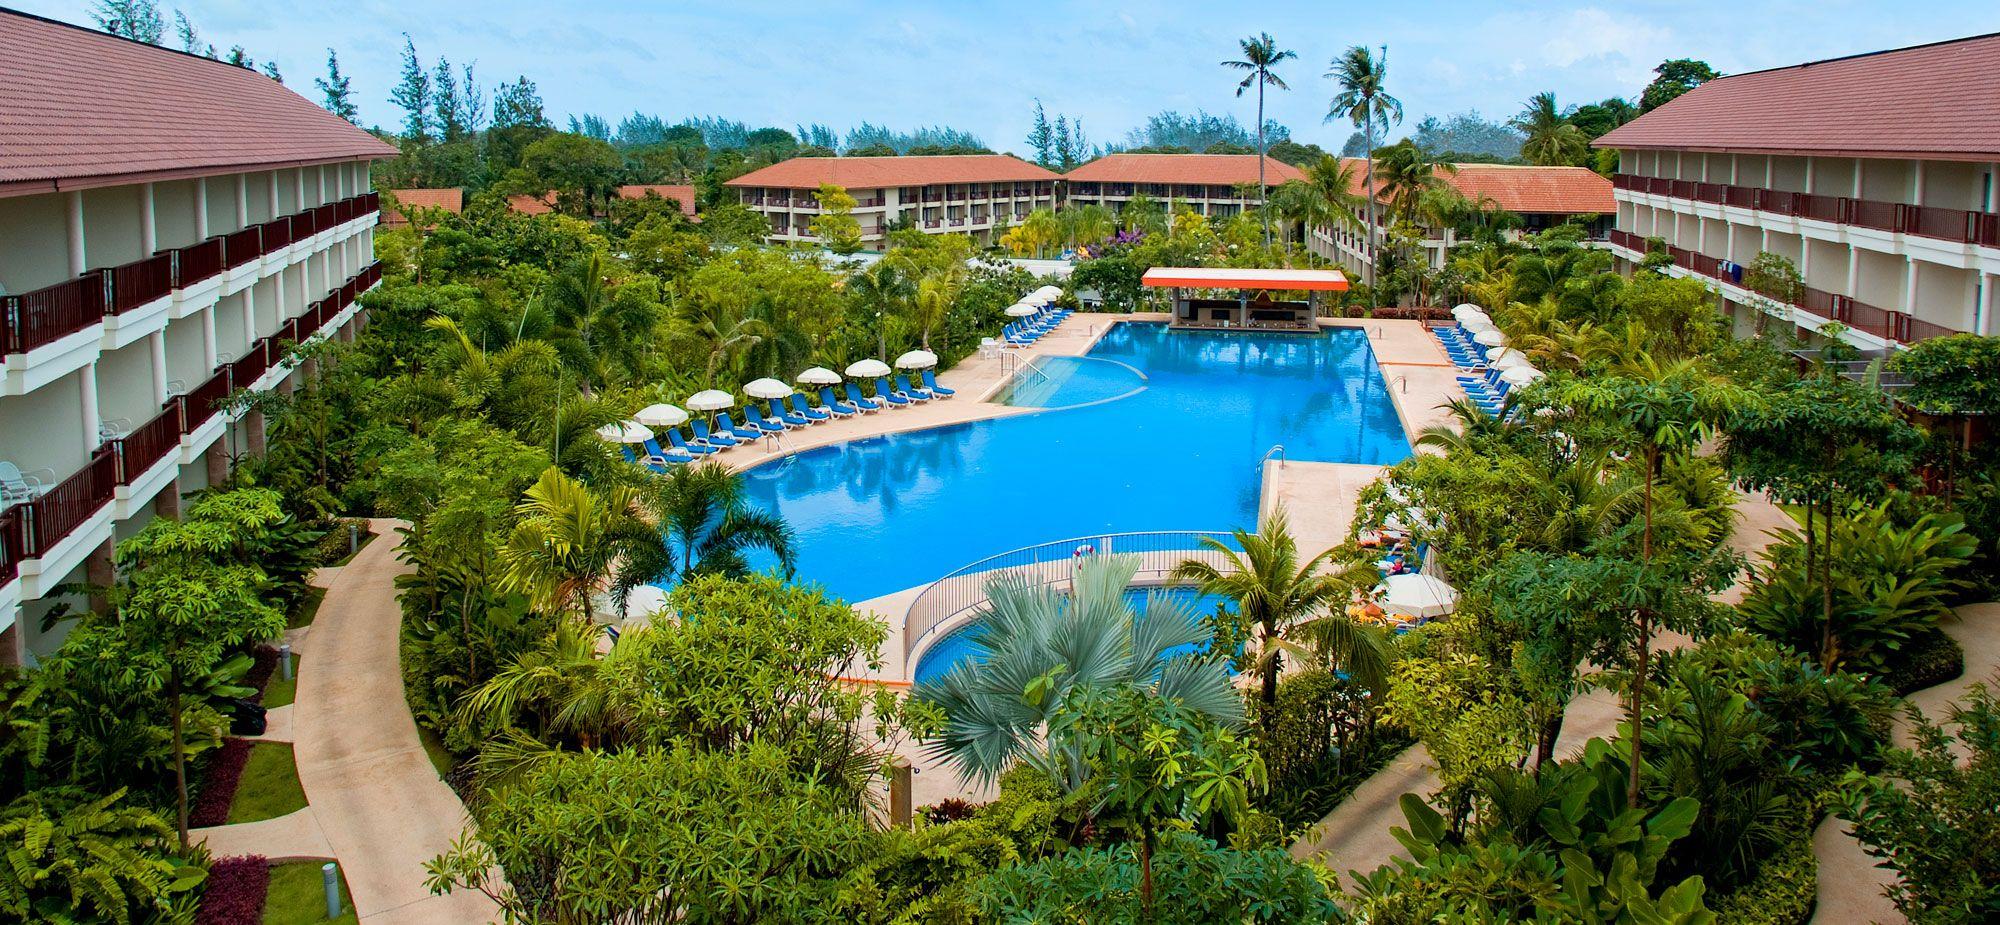 Sawasdee Village Hotel Resort Kata Phuket Thailand